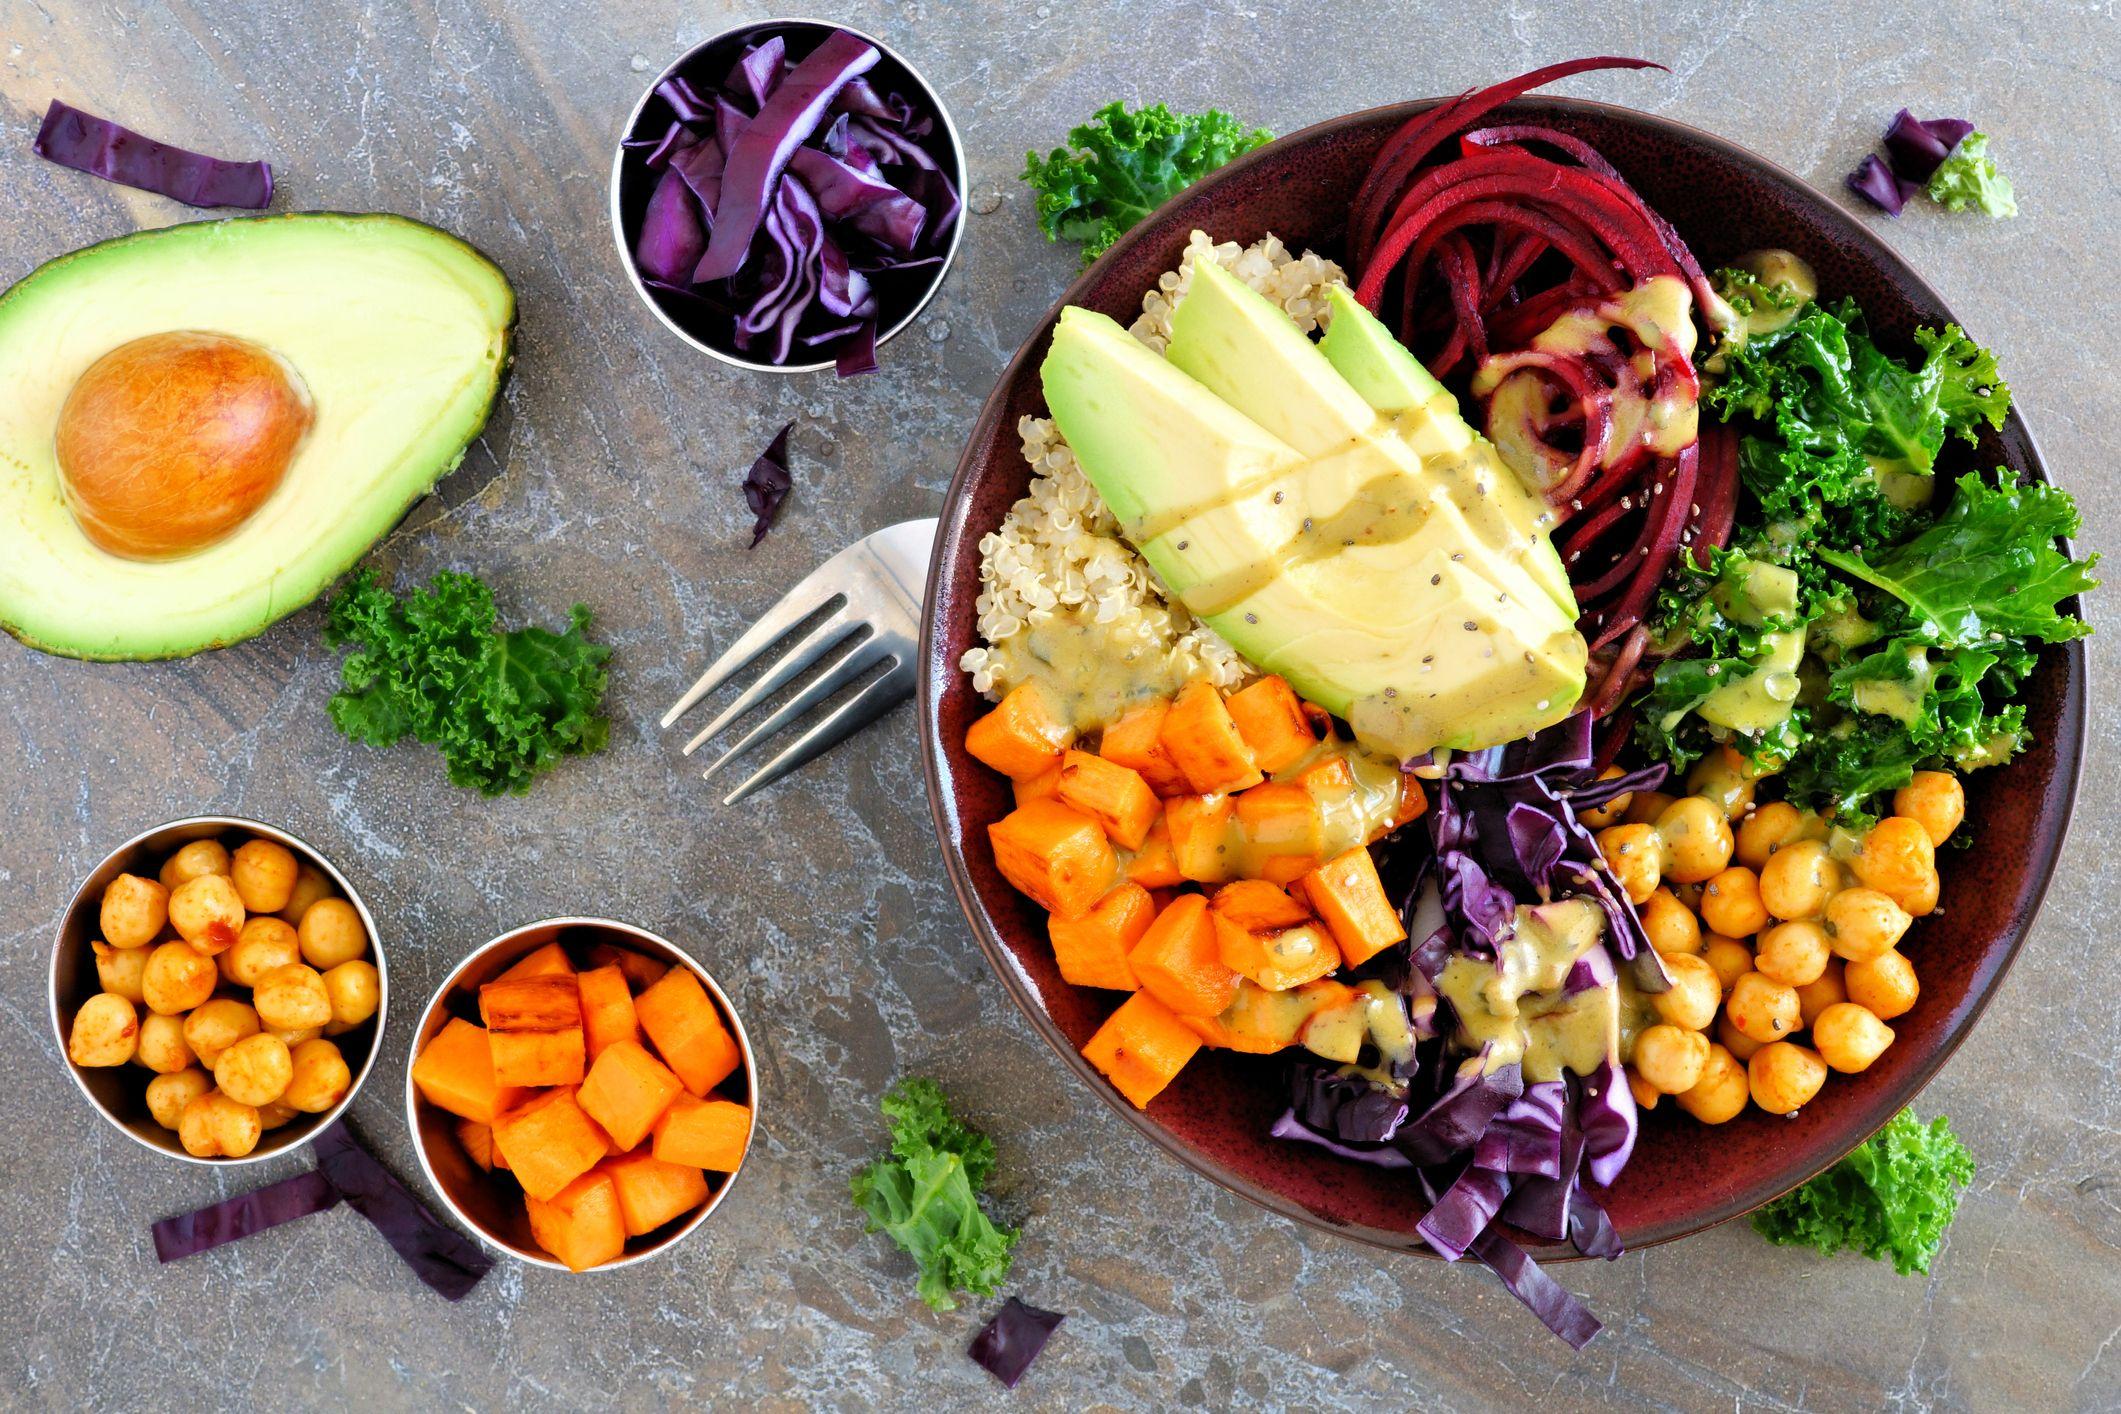 Go lower diet plan cost